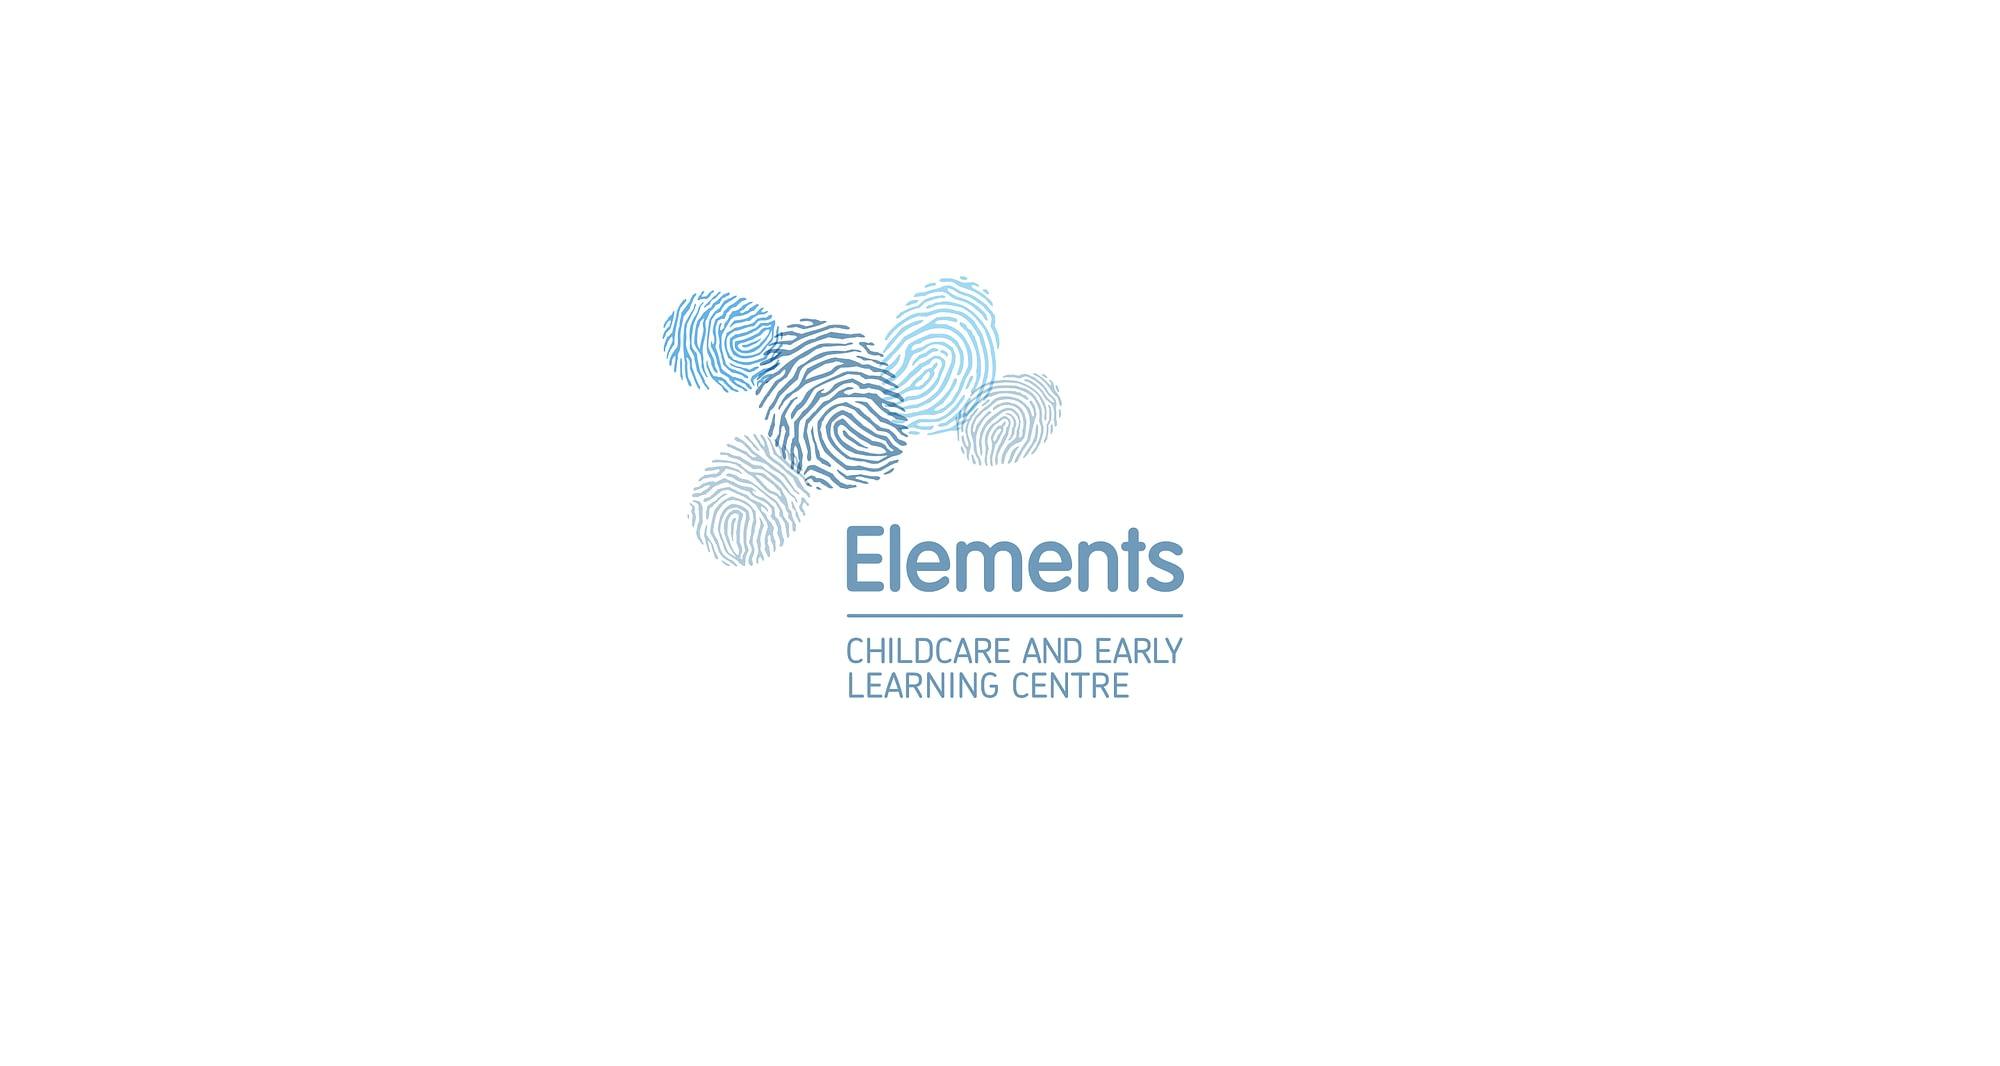 Elements brandmark blue